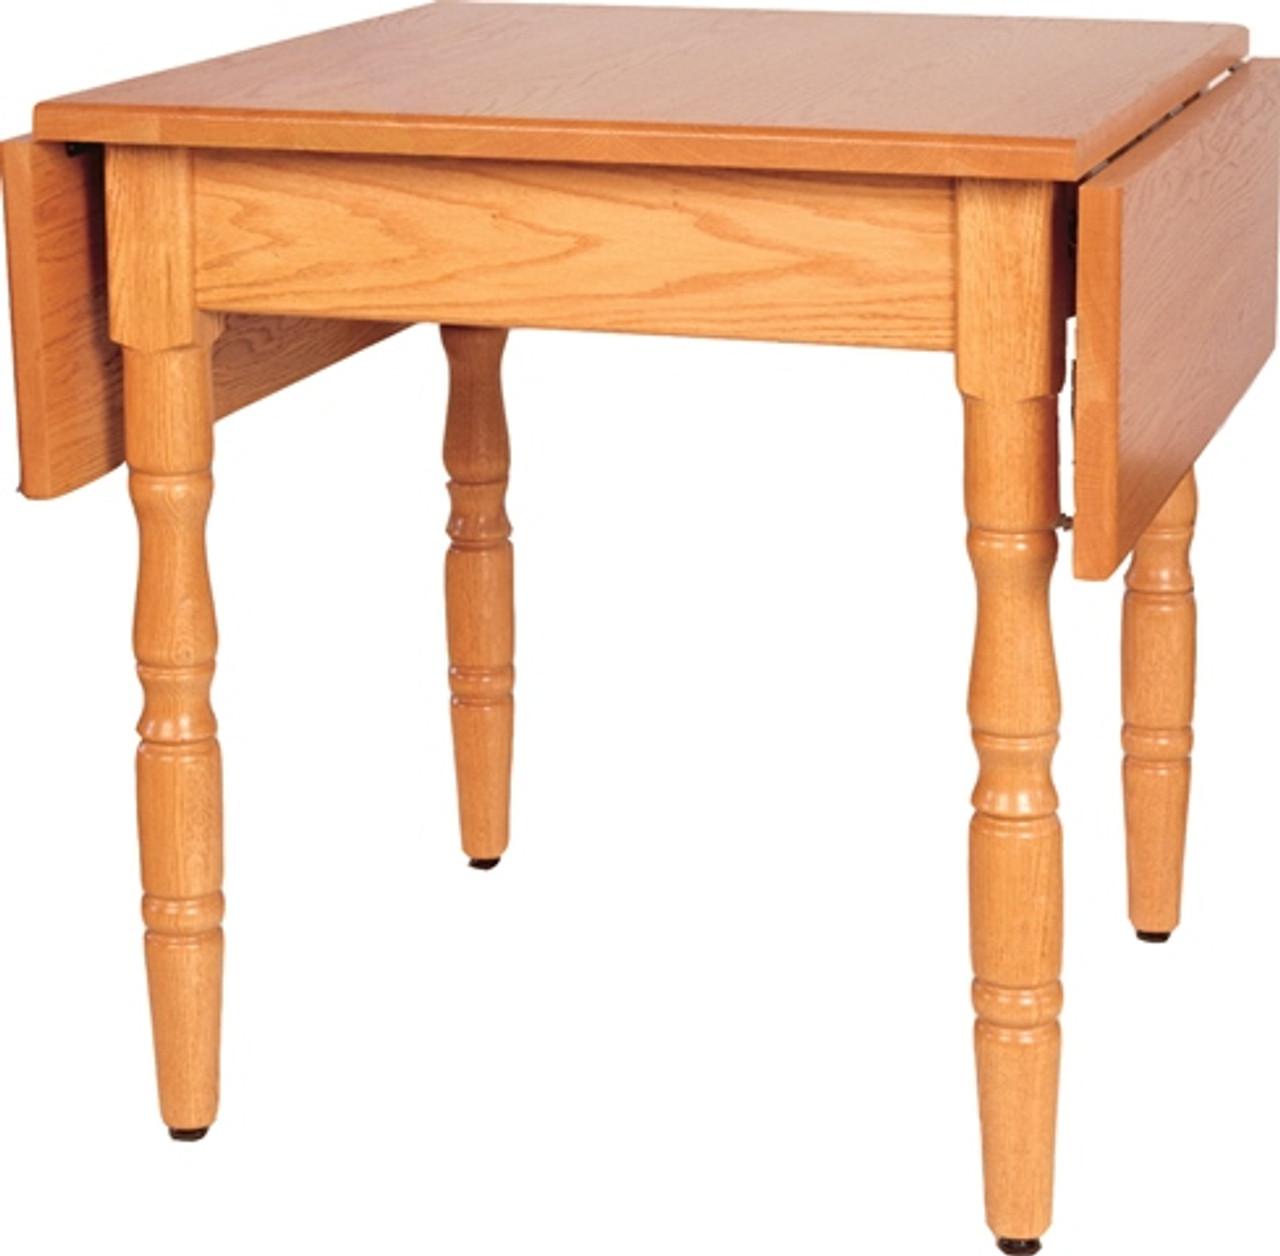 MF701 Drop Leaf Kitchen Table